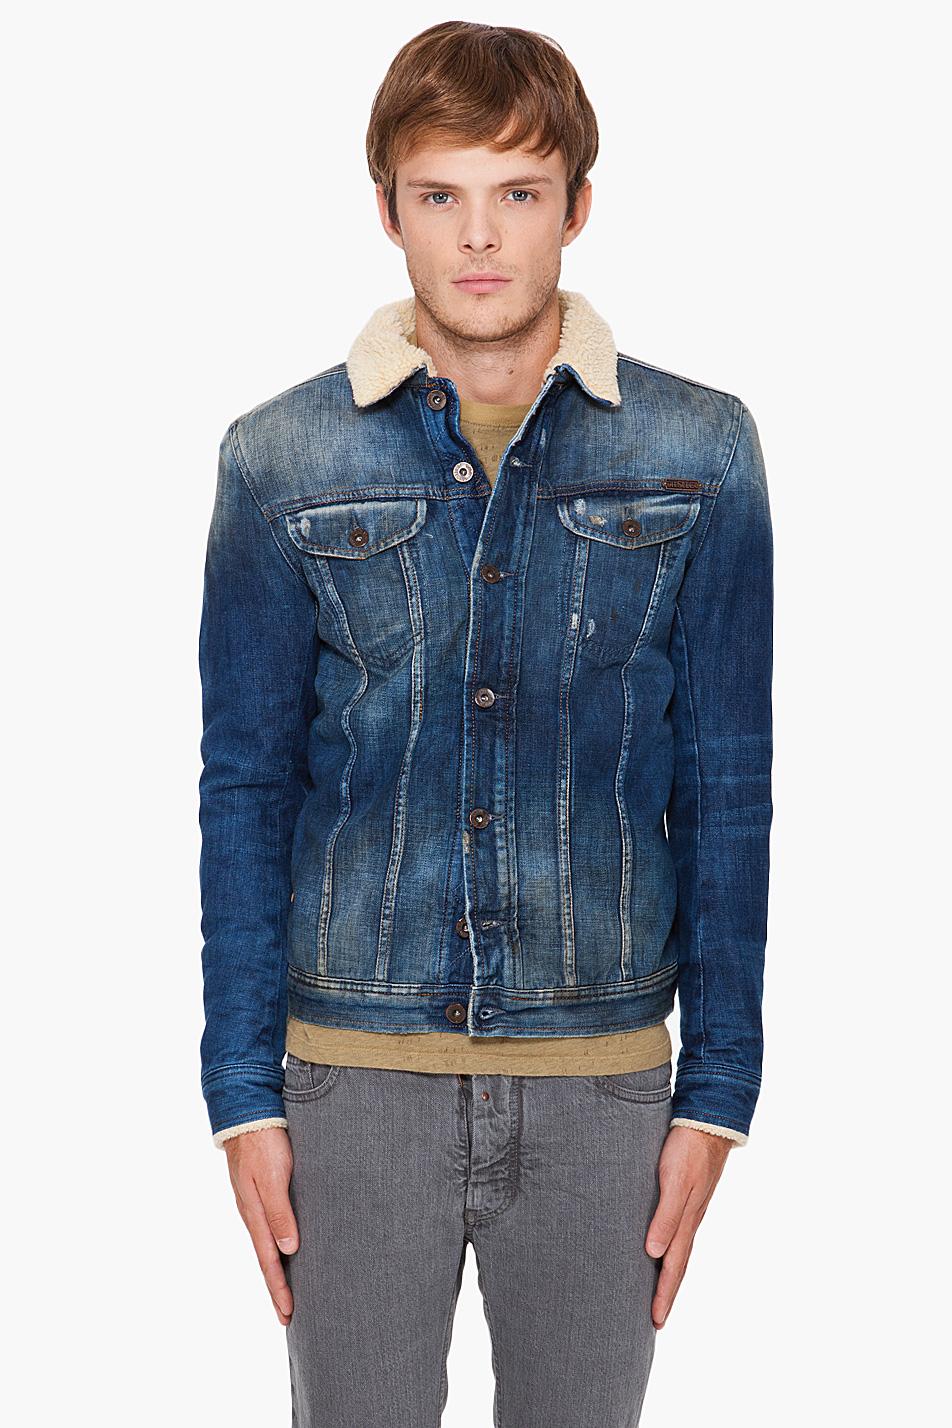 Diesel Faux Fur Lined Denim Jacket In Blue For Men Denim